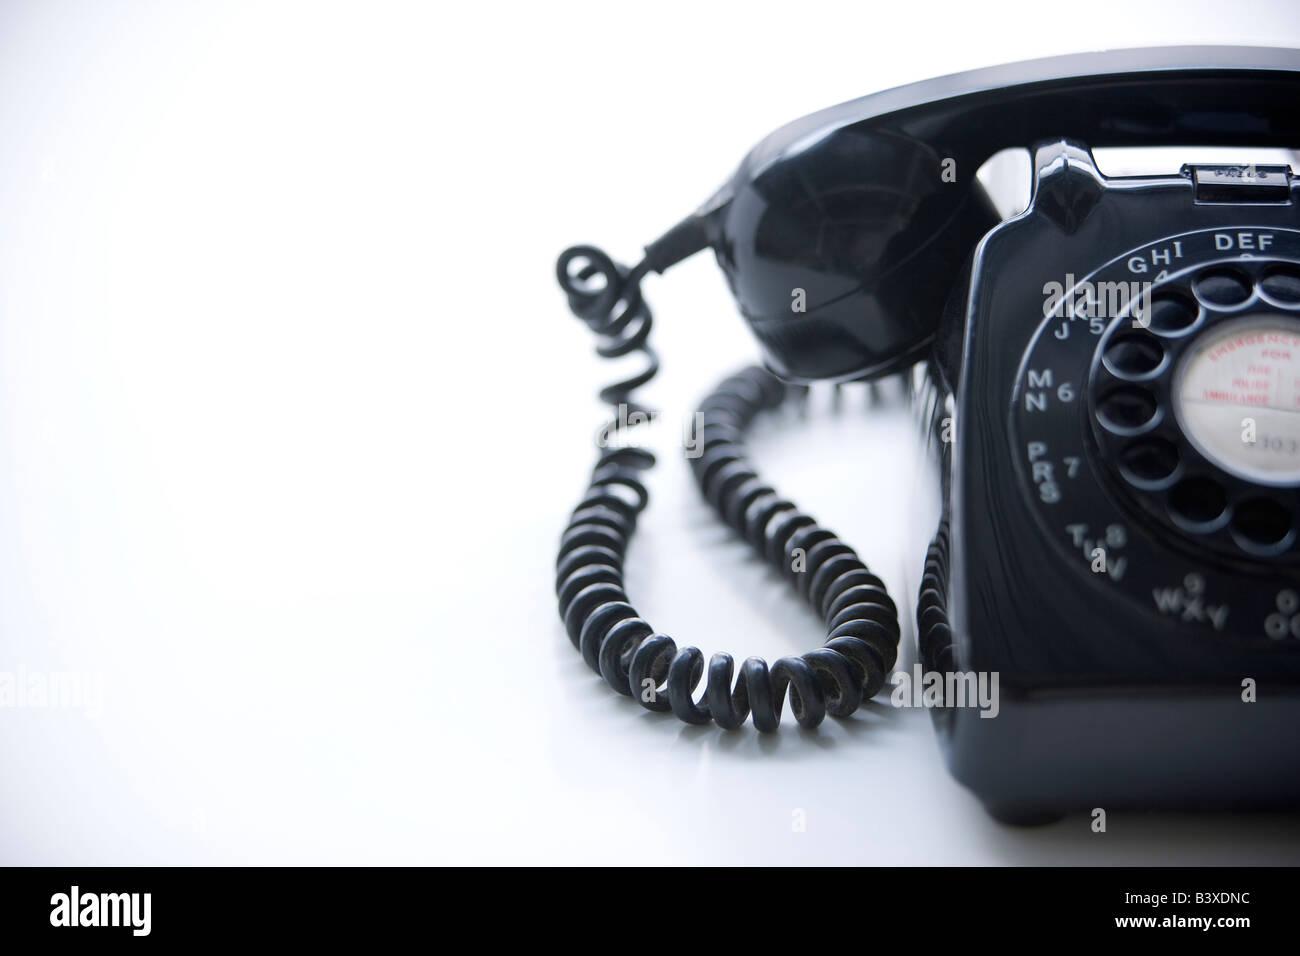 Studio Shot Of A Black Rotary Phone - Stock Image